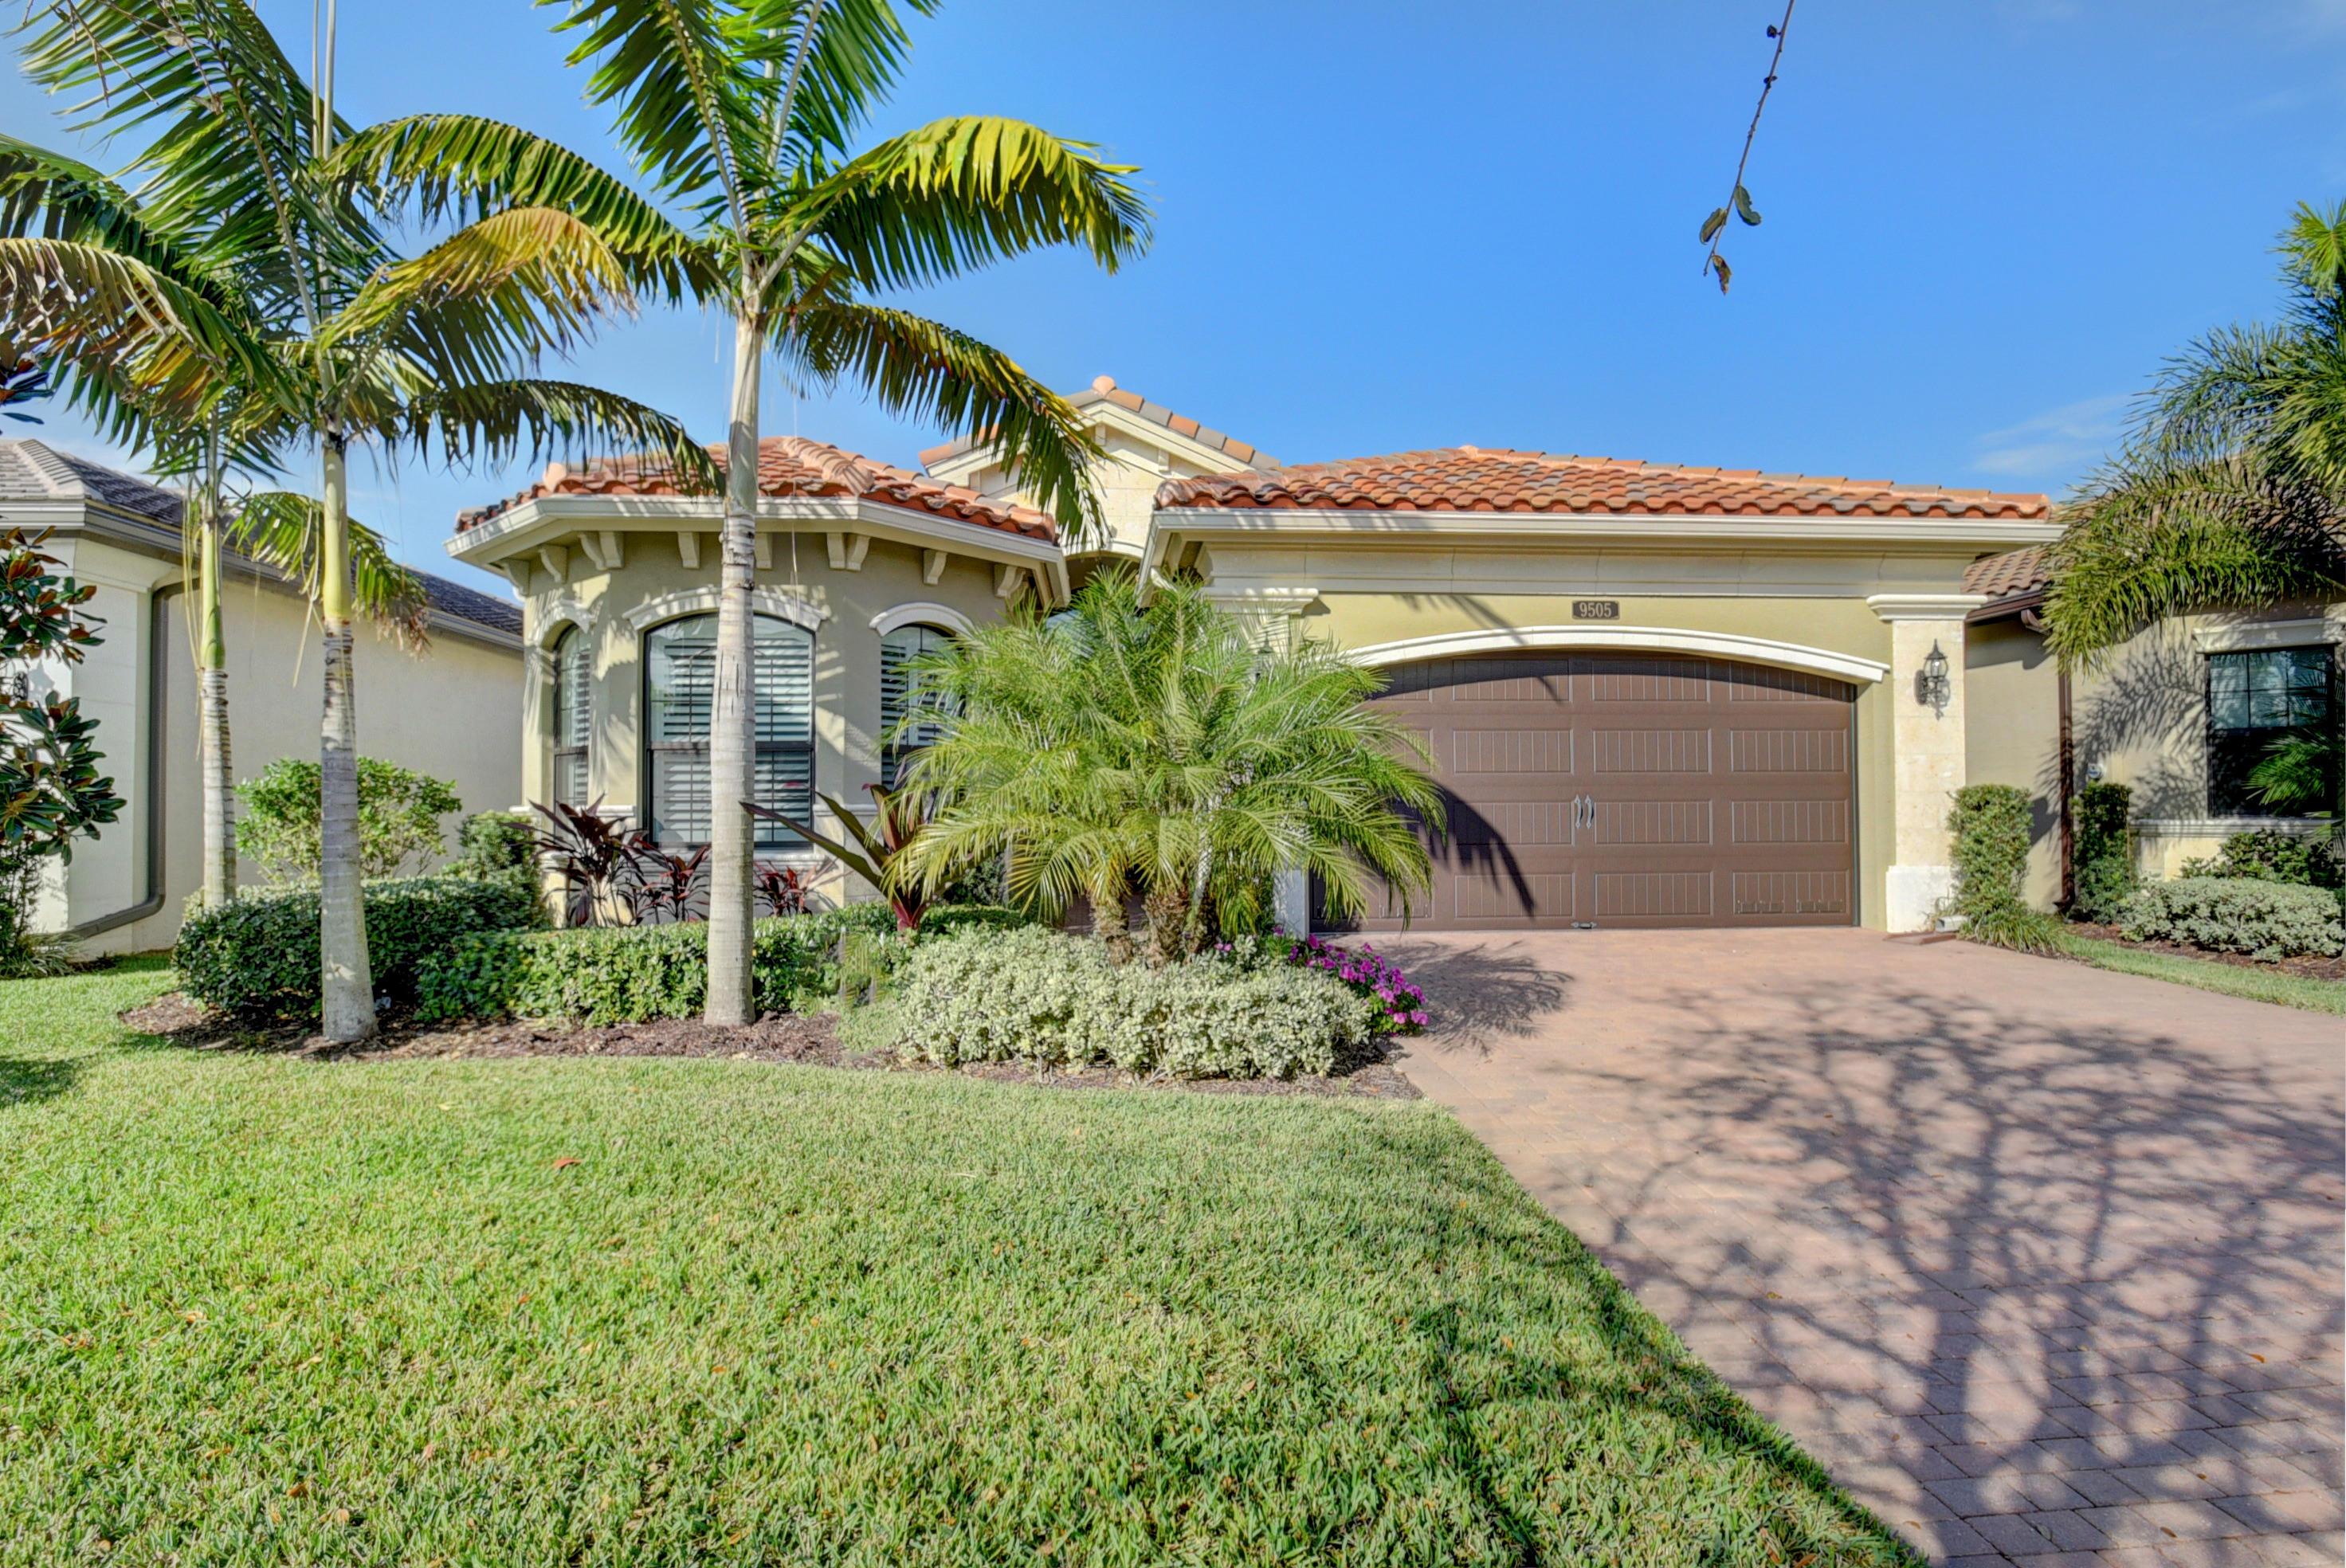 9505 Eden Roc Court, Delray Beach, Florida 33446, 3 Bedrooms Bedrooms, ,3 BathroomsBathrooms,Single Family,For Sale,SEVEN BRIDGES,Eden Roc,RX-10499154